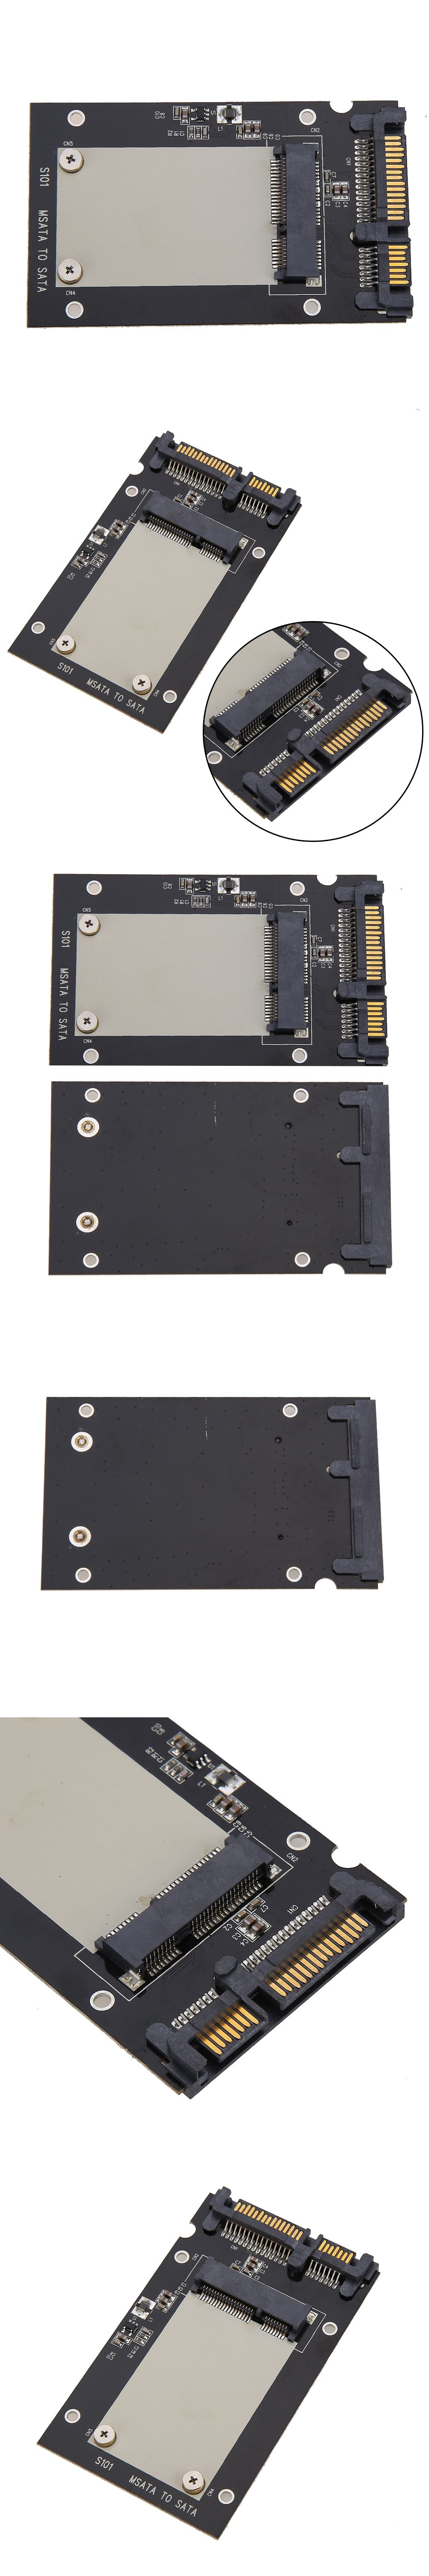 Universal Standard Msata Mini Ssd To 25 Inch Sata 22 Pin Converter Adapter Card For